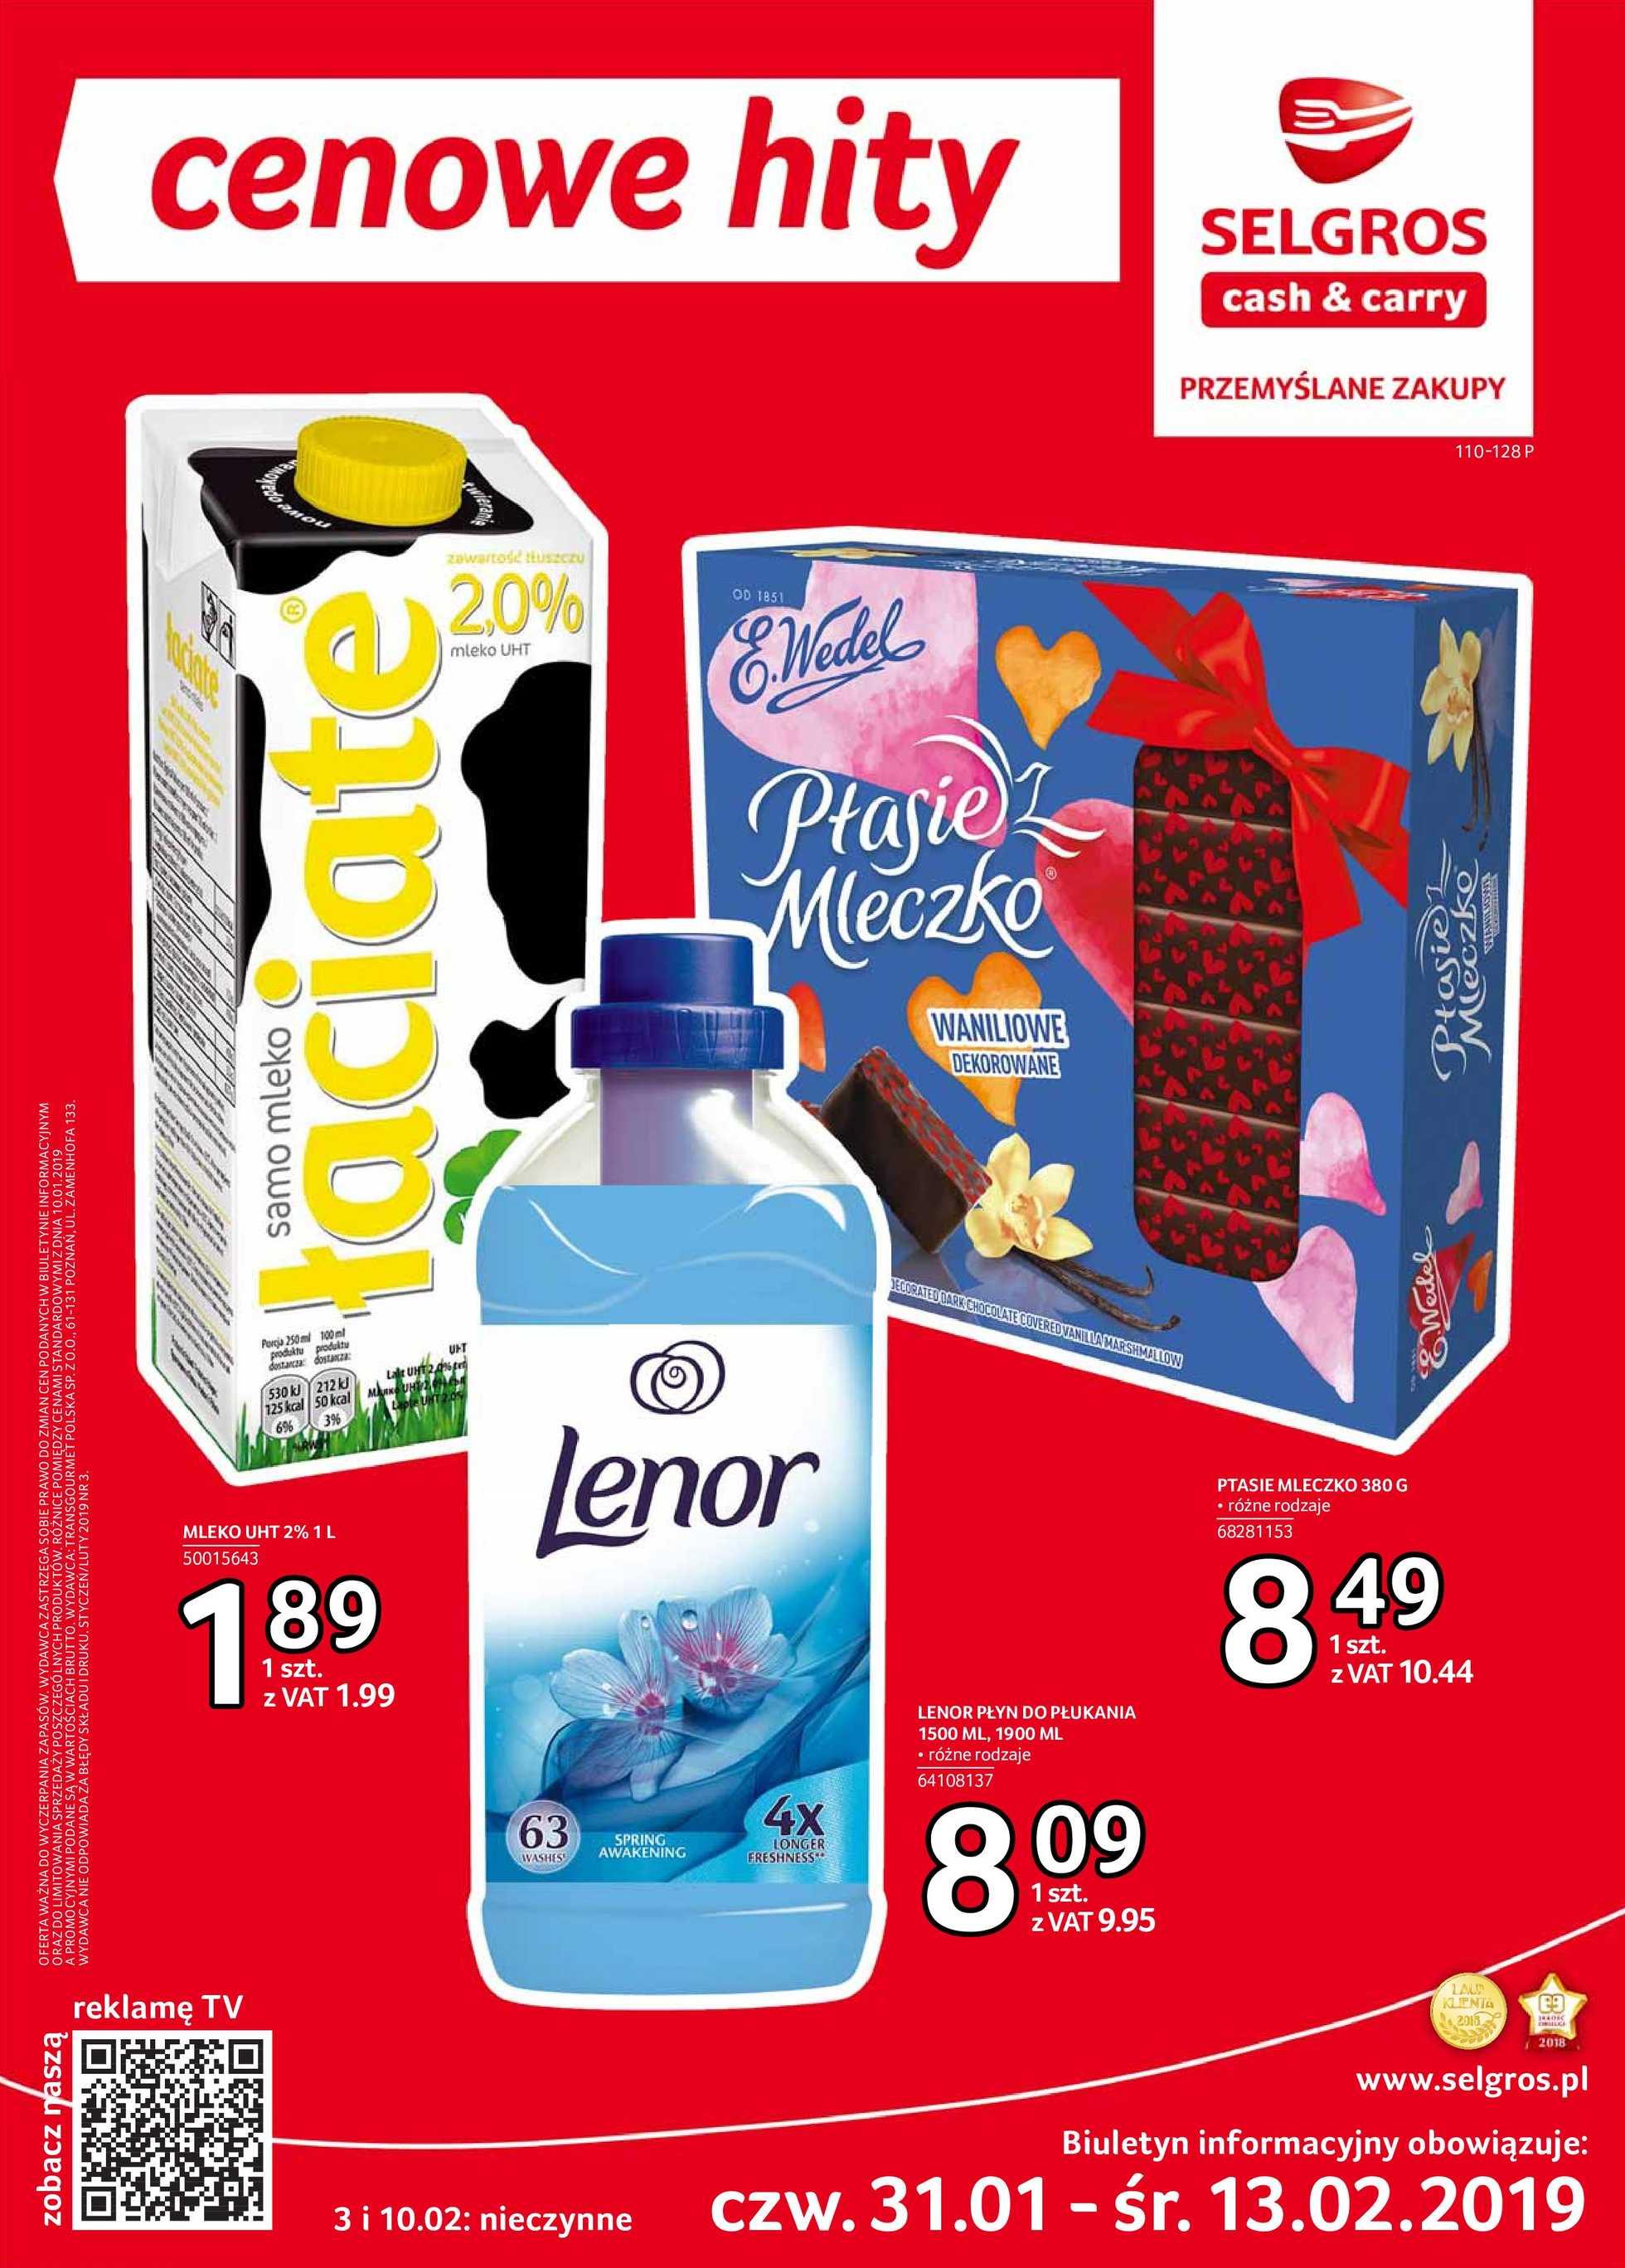 Selgros Cash&Carry - gazetka promocyjna ważna od 31.01.2019 do 13.02.2019 - strona 1.